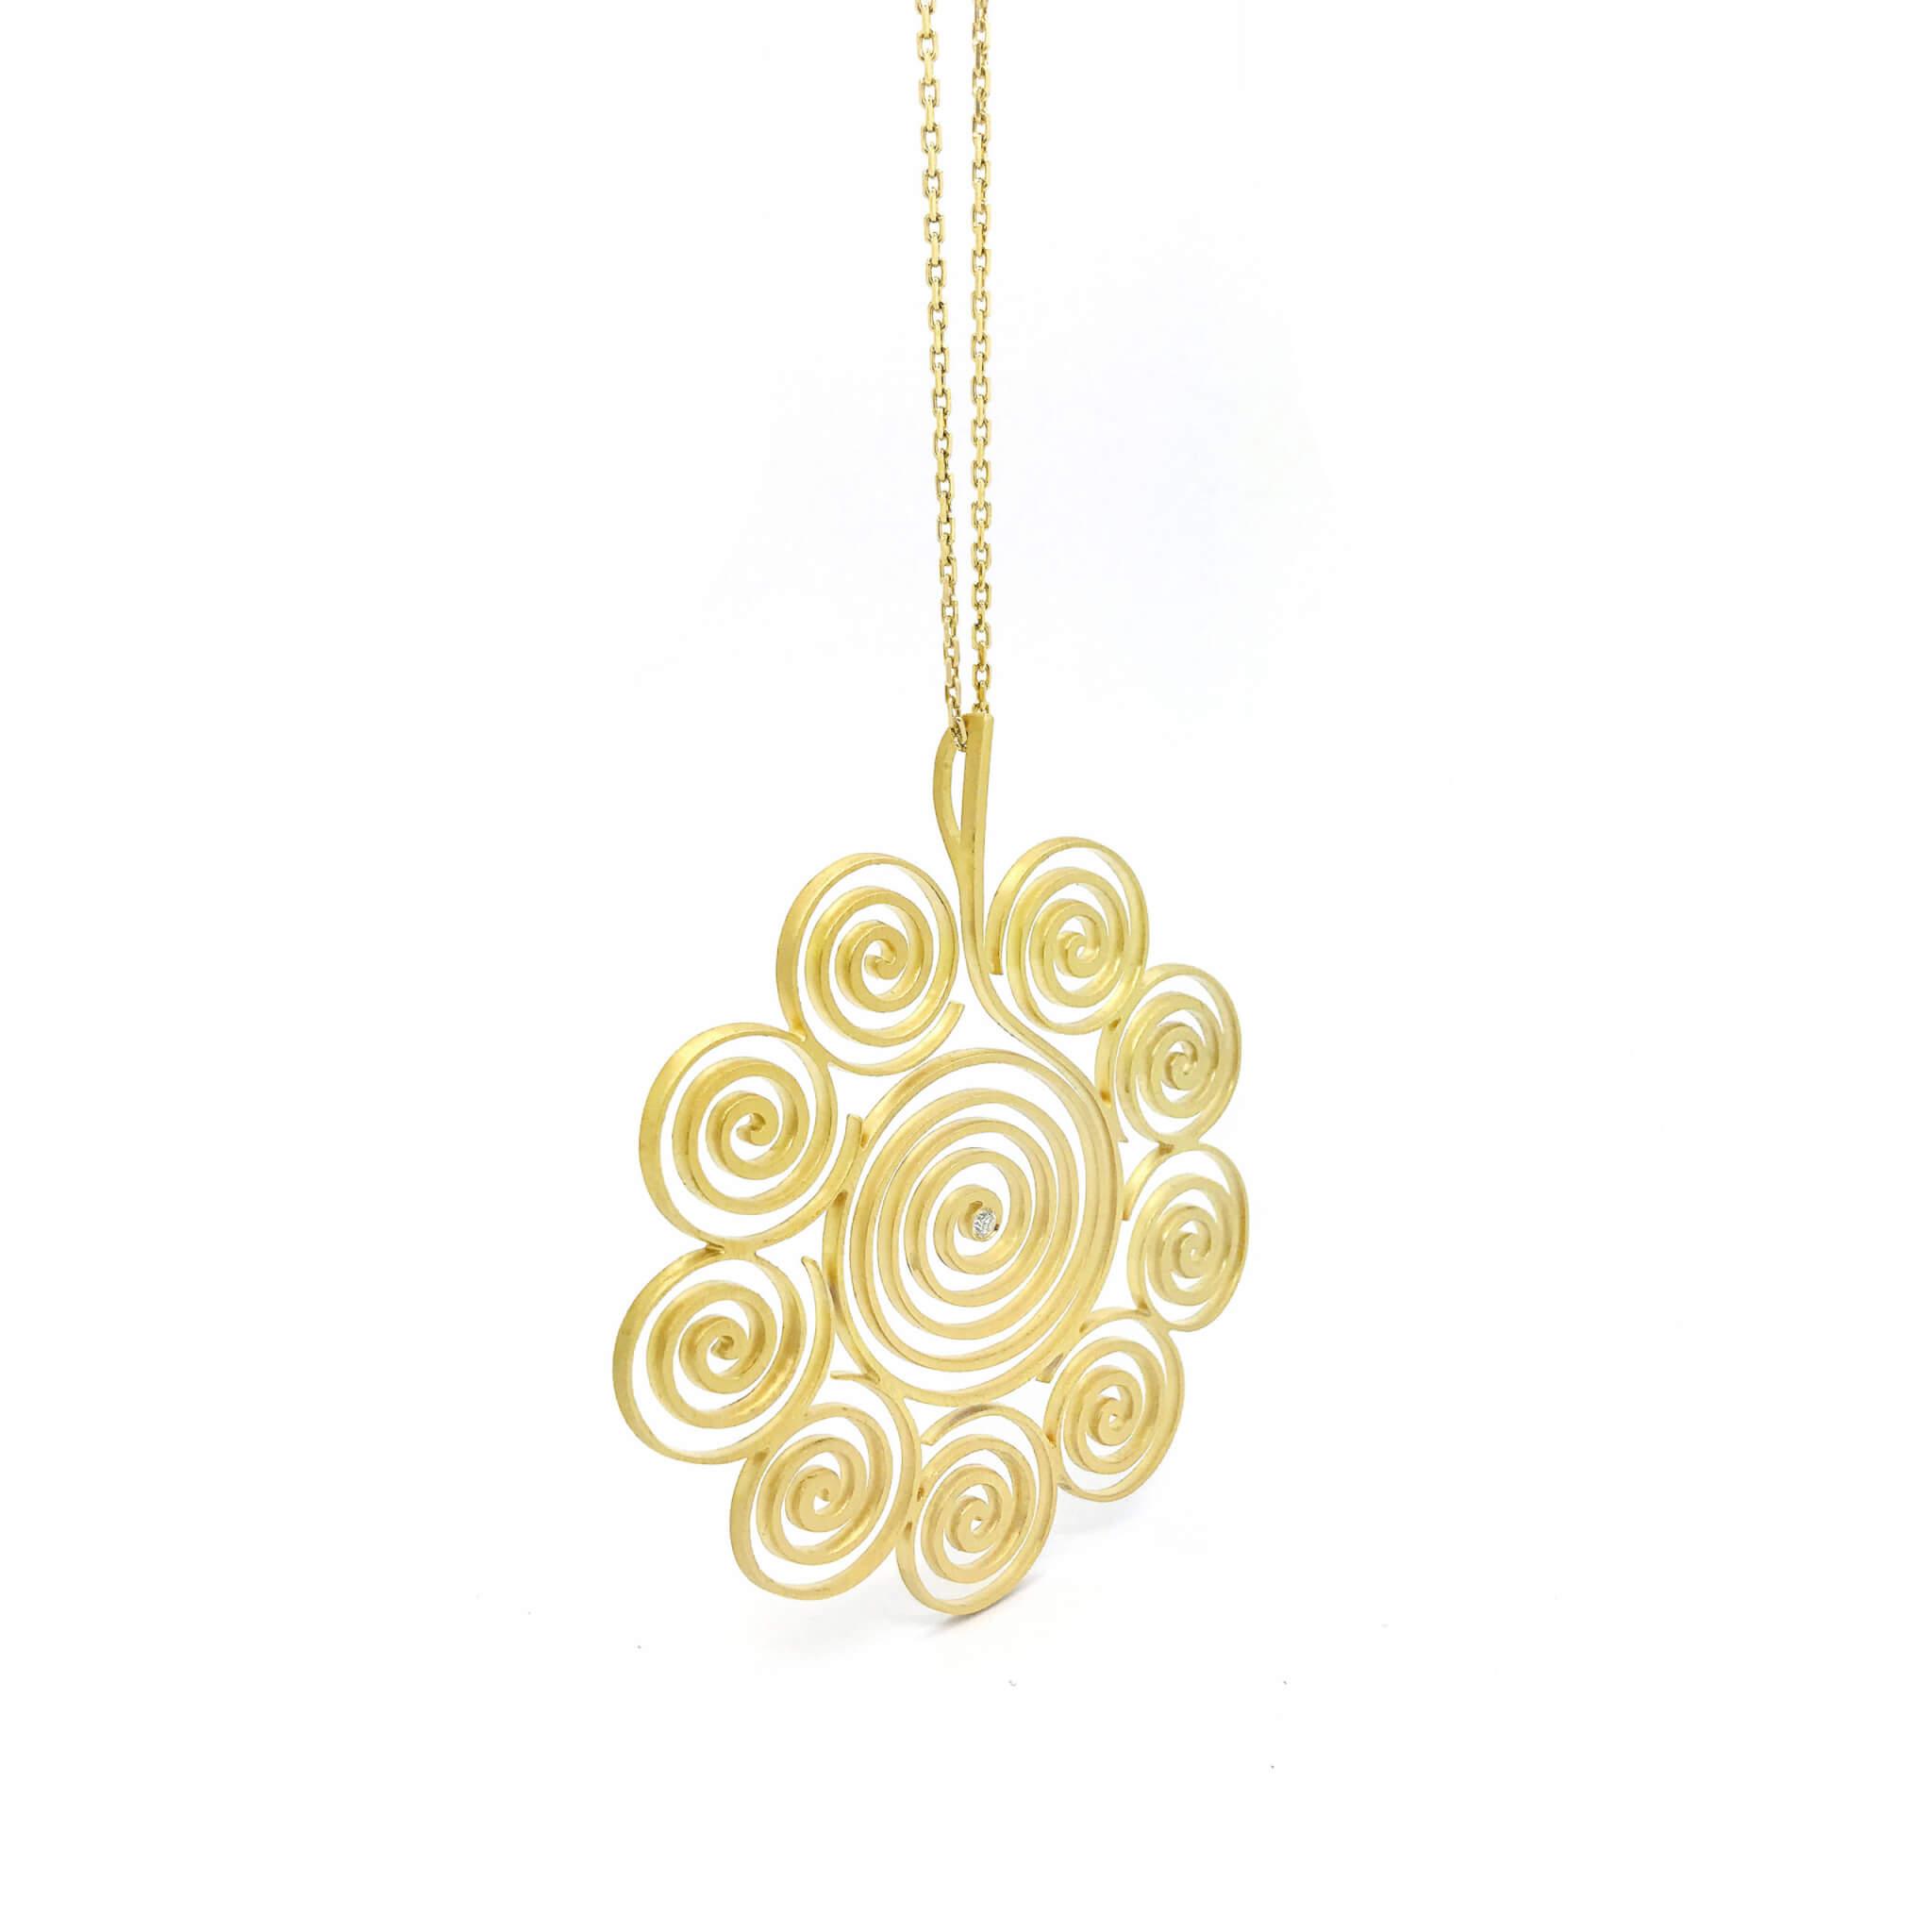 Spirale collier or jaune sable diamant